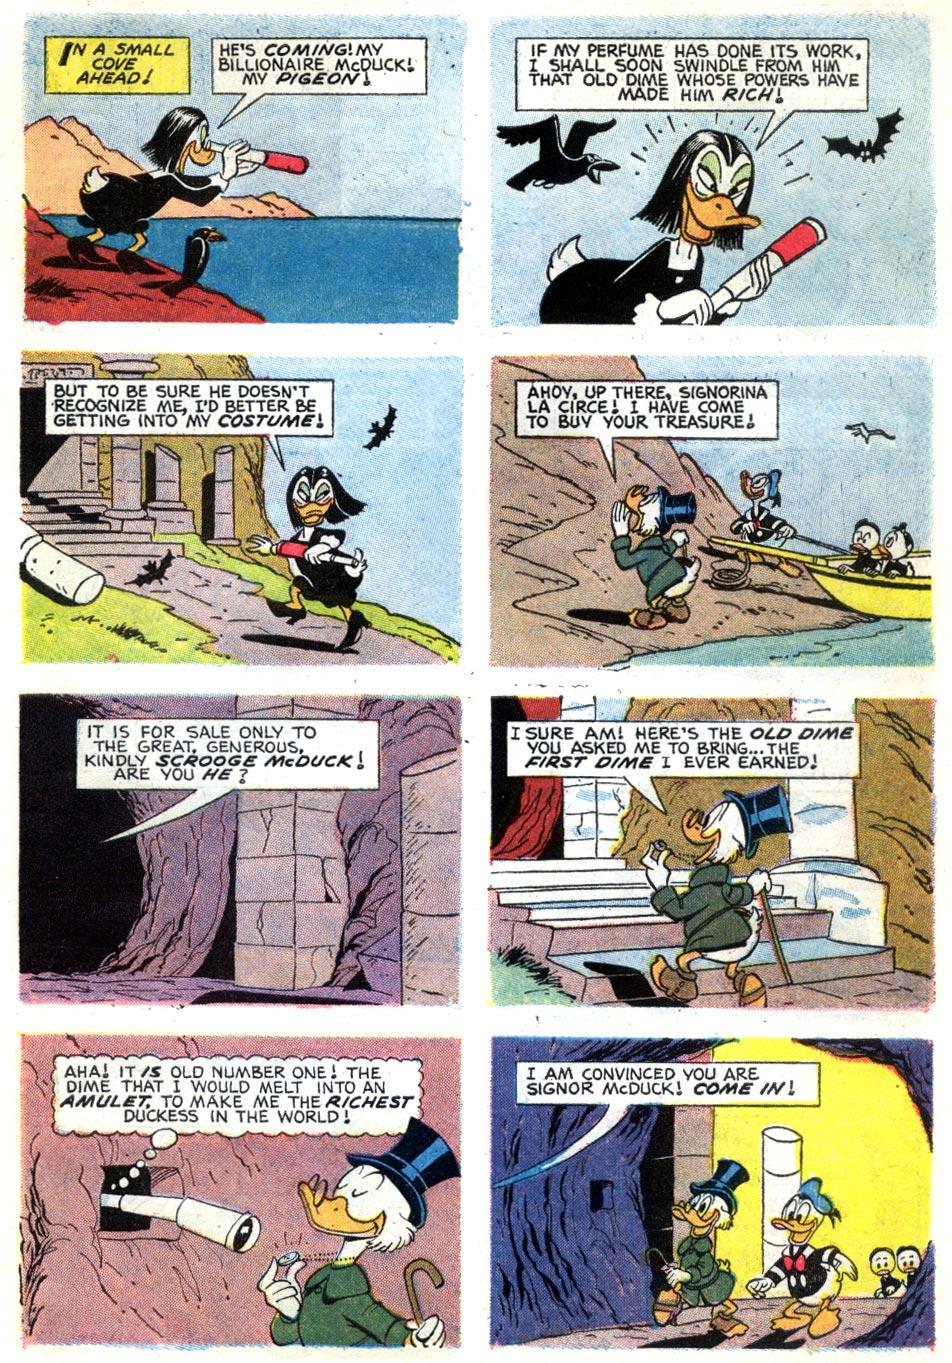 (1953) Issue #329 </opti #365 - English 7